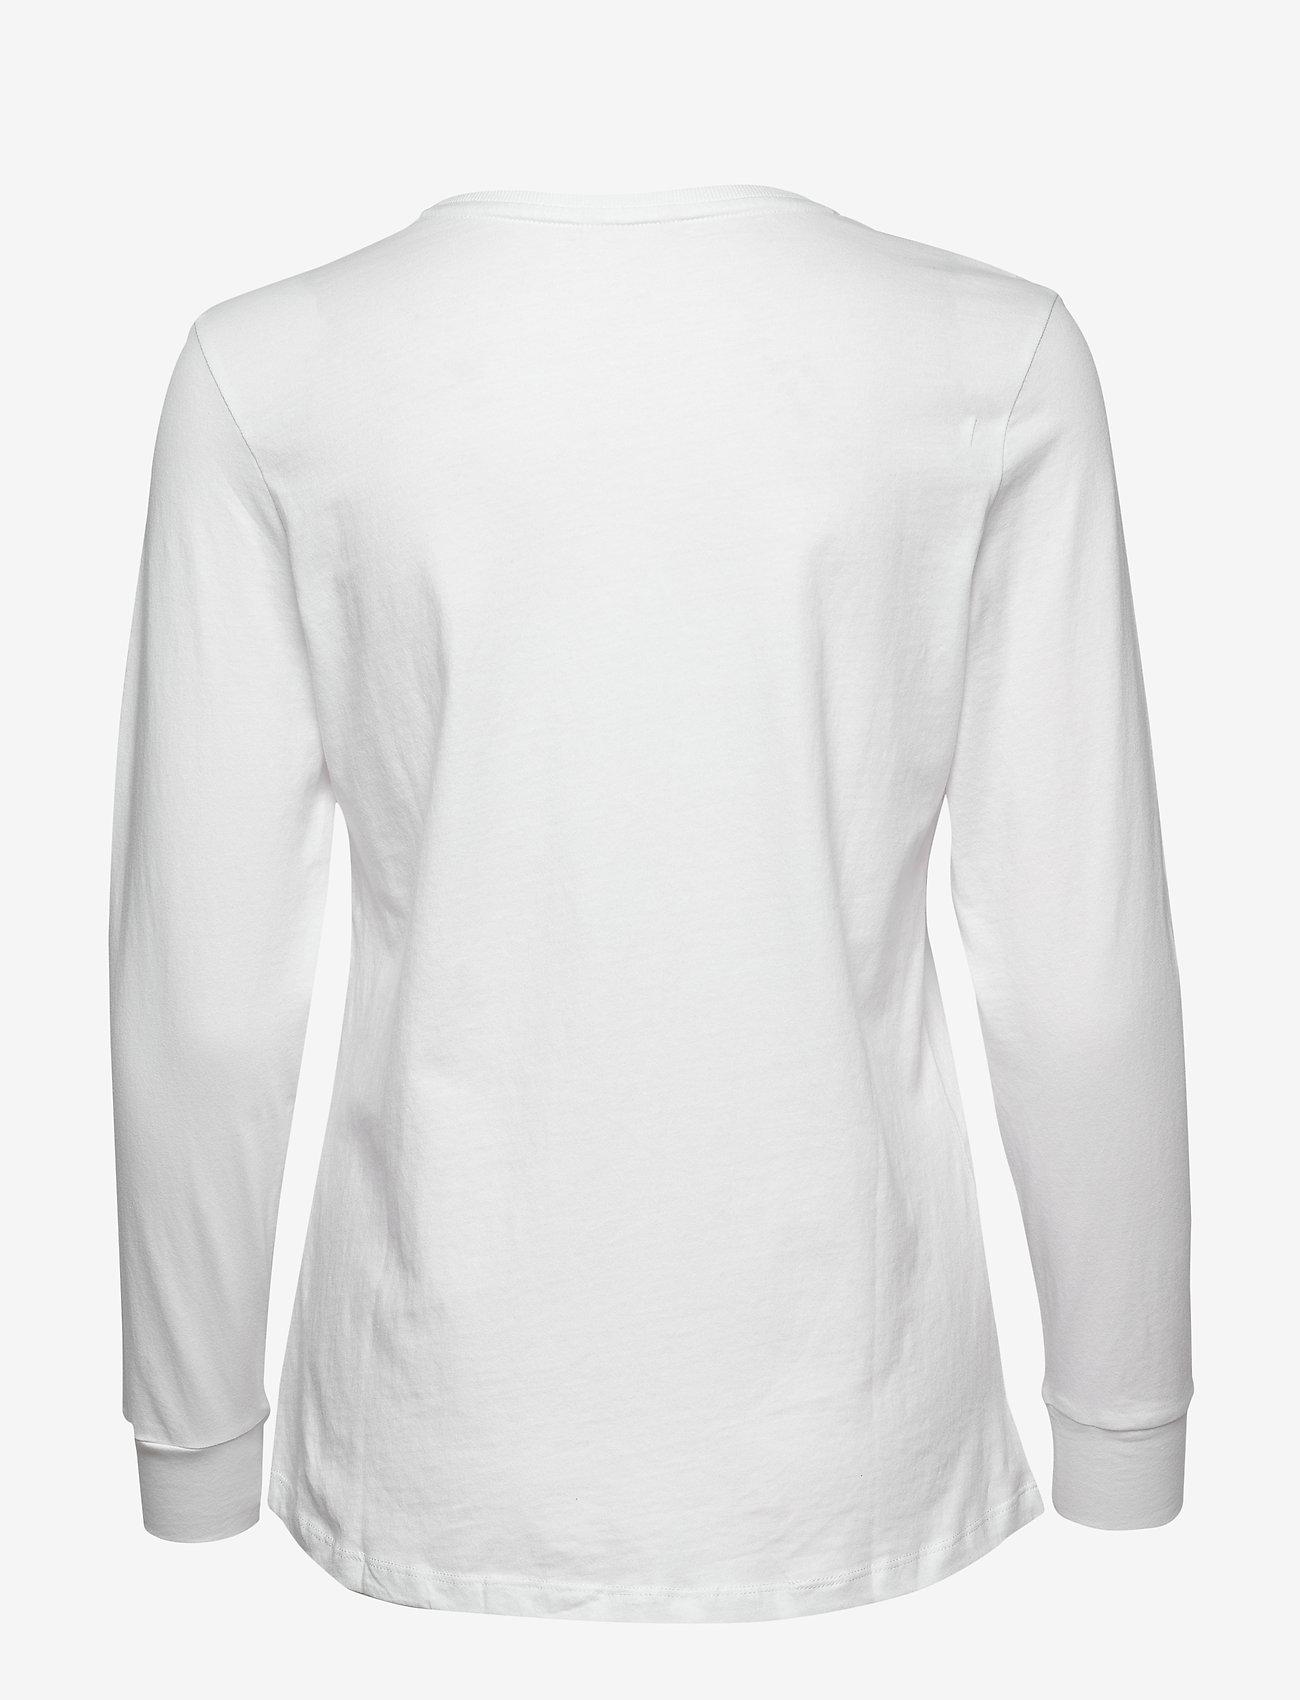 Esprit Bodywear Women - Night-T-Shirts - overdele - white - 1